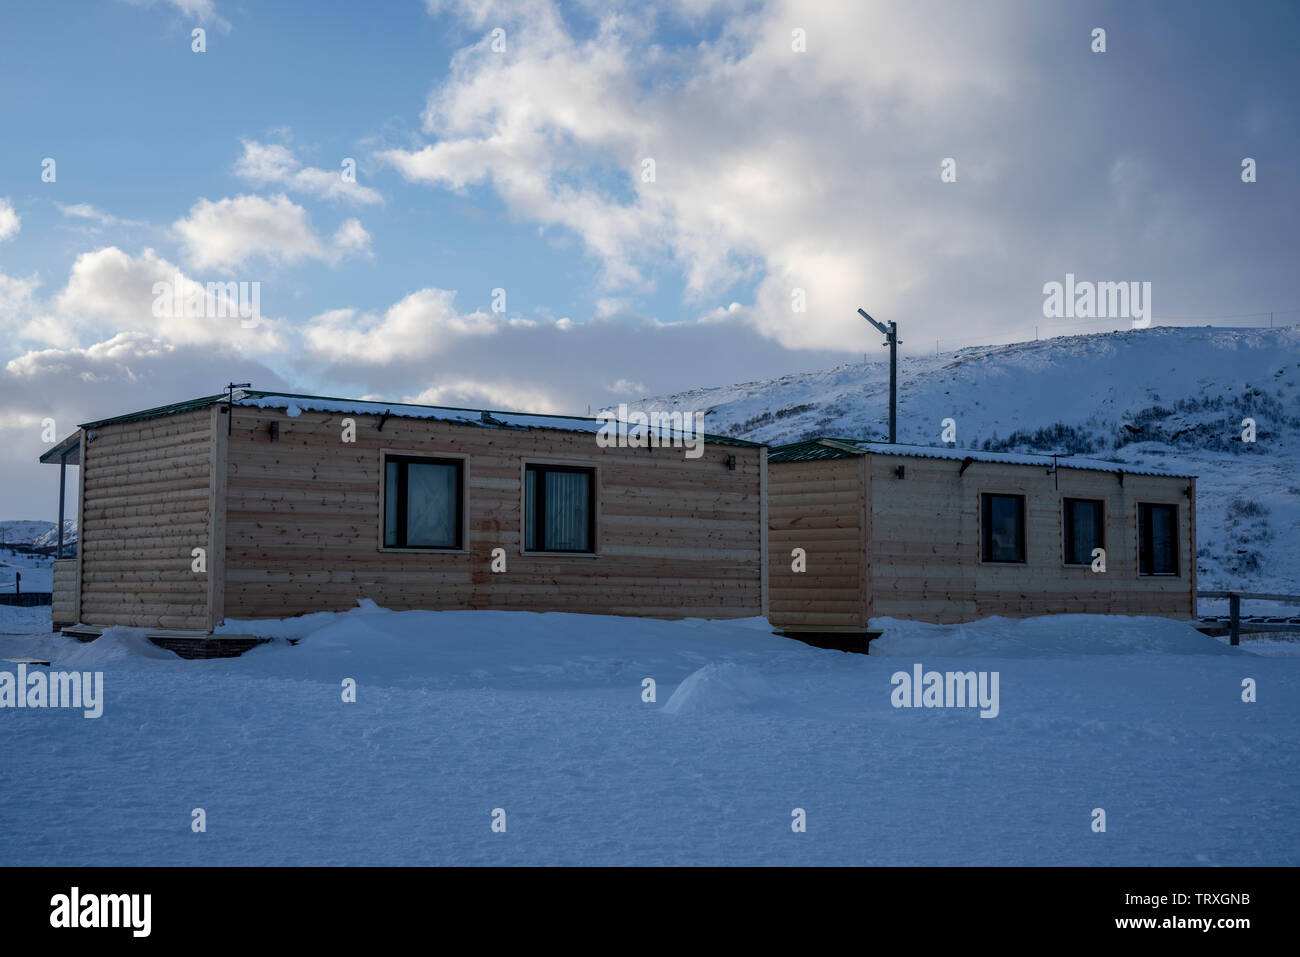 The wooden houses in Teriberka. Winter, Murmansk. - Stock Image